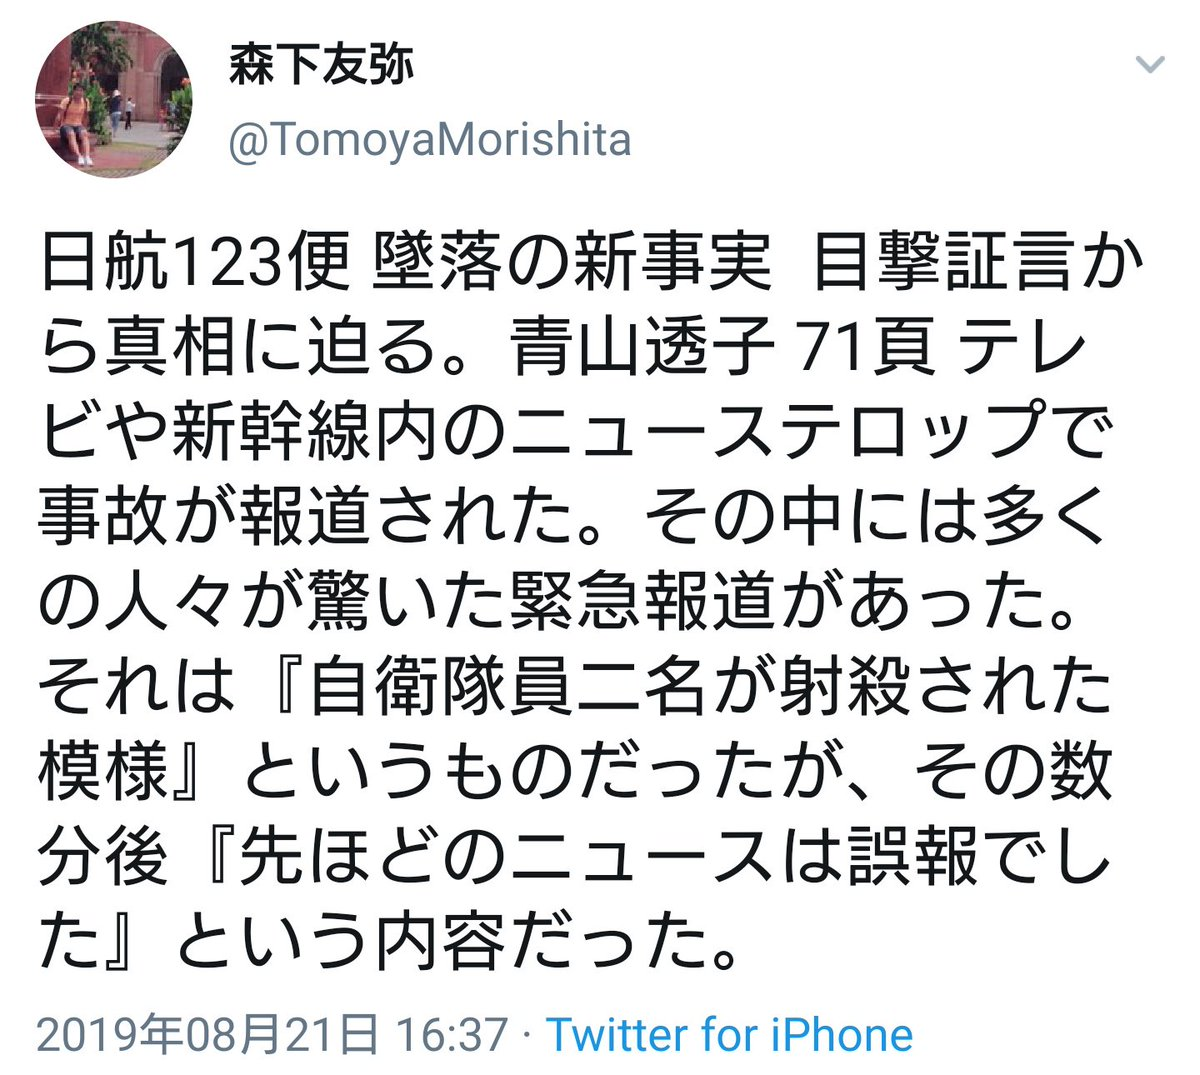 RT @araichuu: 陰謀論者が鉄道オタクにボコボコにされてるの痛快すぎる。 https://t.co/n77SmgqcYi